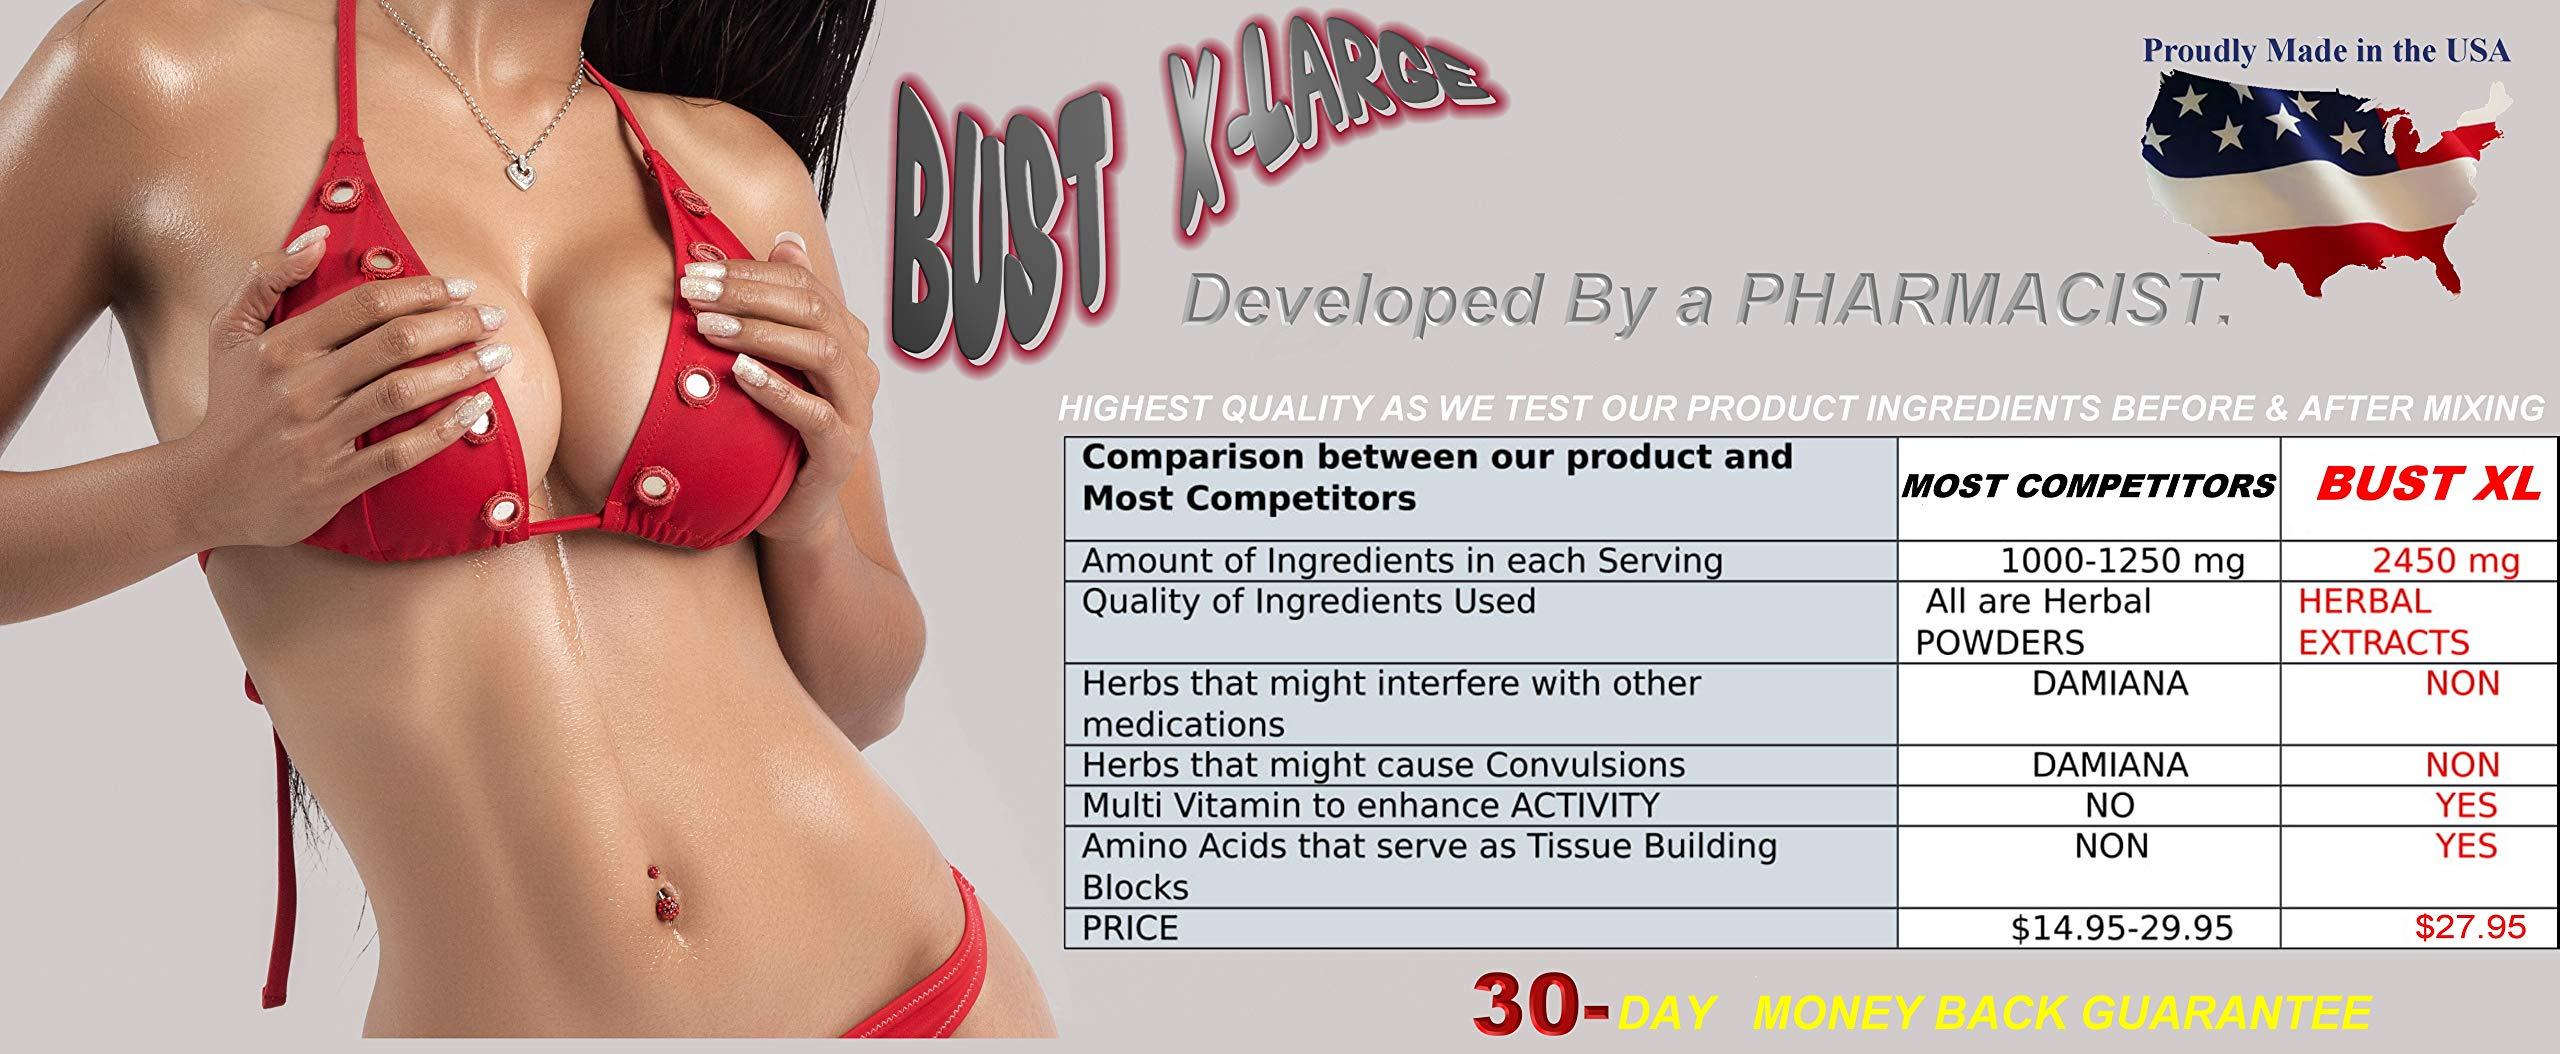 Bust X-Large Breast Enlargement, Breast Enhancer, Bust Enhancement Pills - Enjoy Larger, Fuller, Firmer Breasts. (Not a Breast Cream). 1 Month Supply